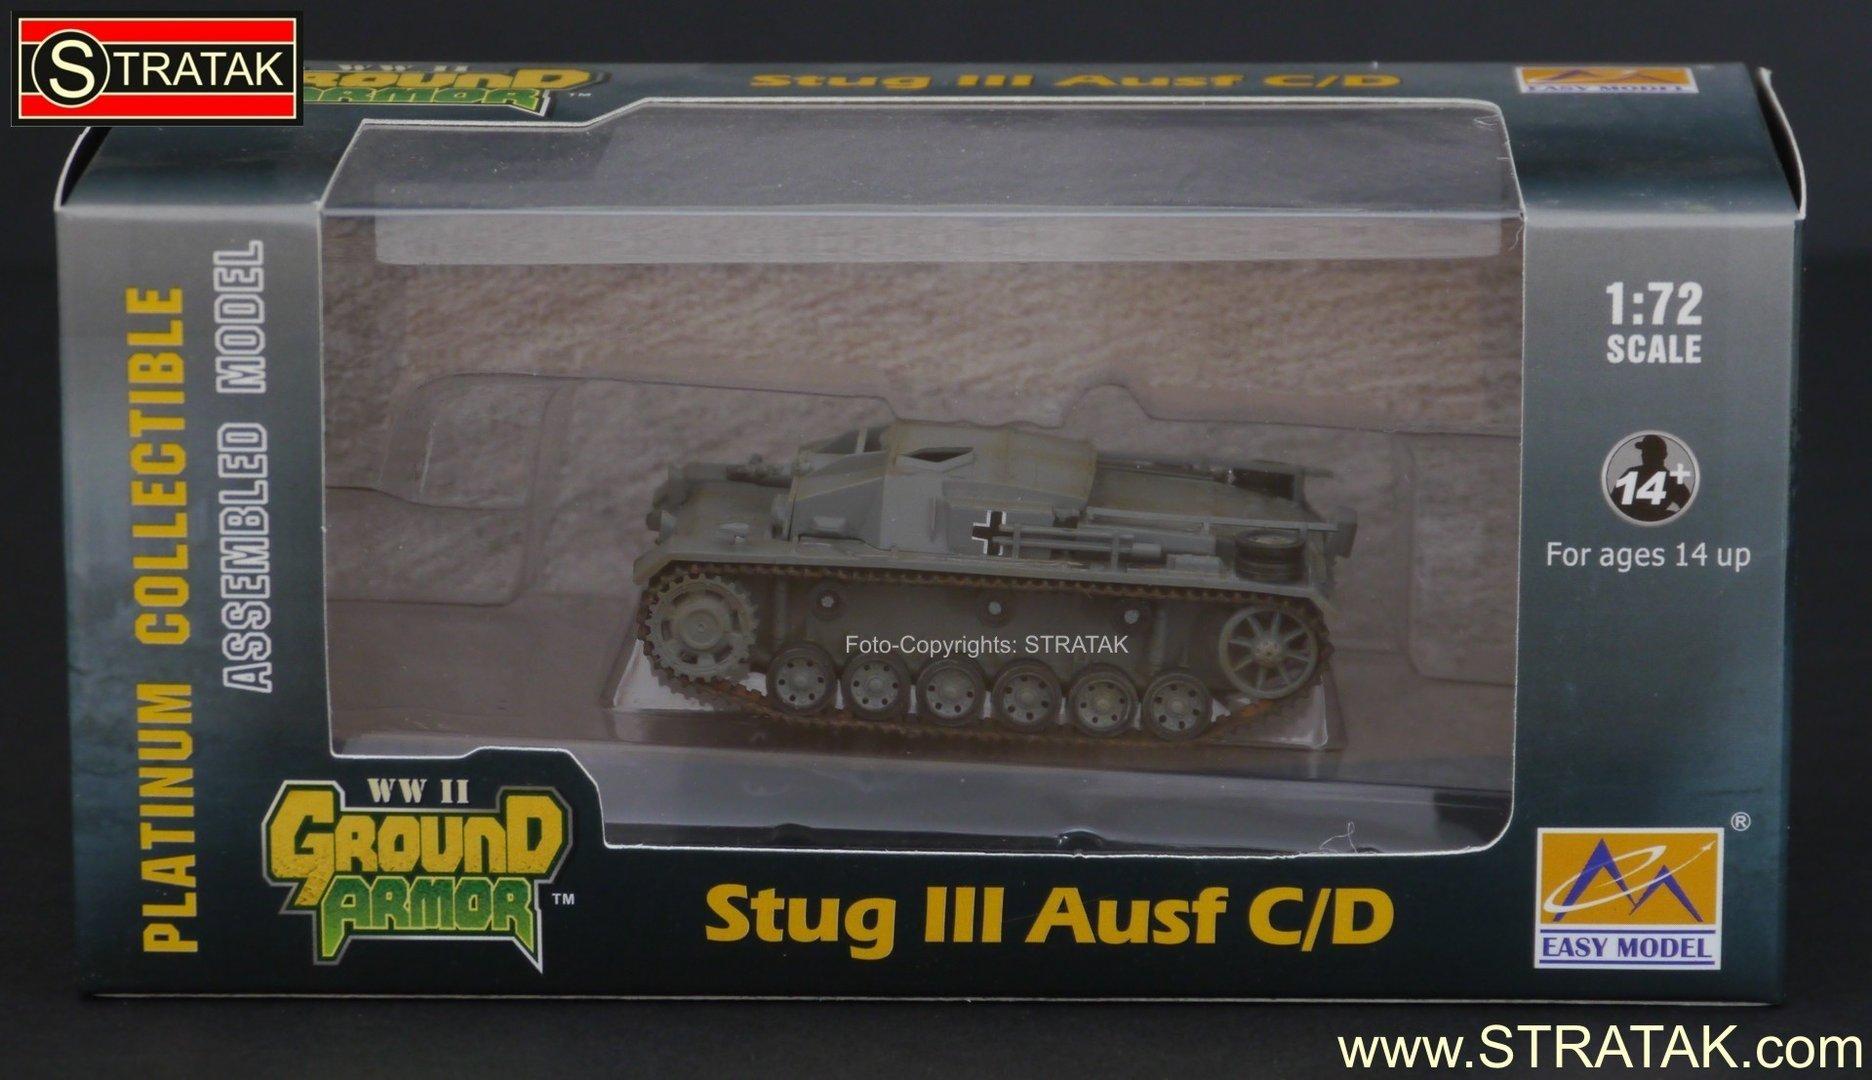 Easy Model 36139 StuG III Ausf. C/D SV 288 Africa 1942